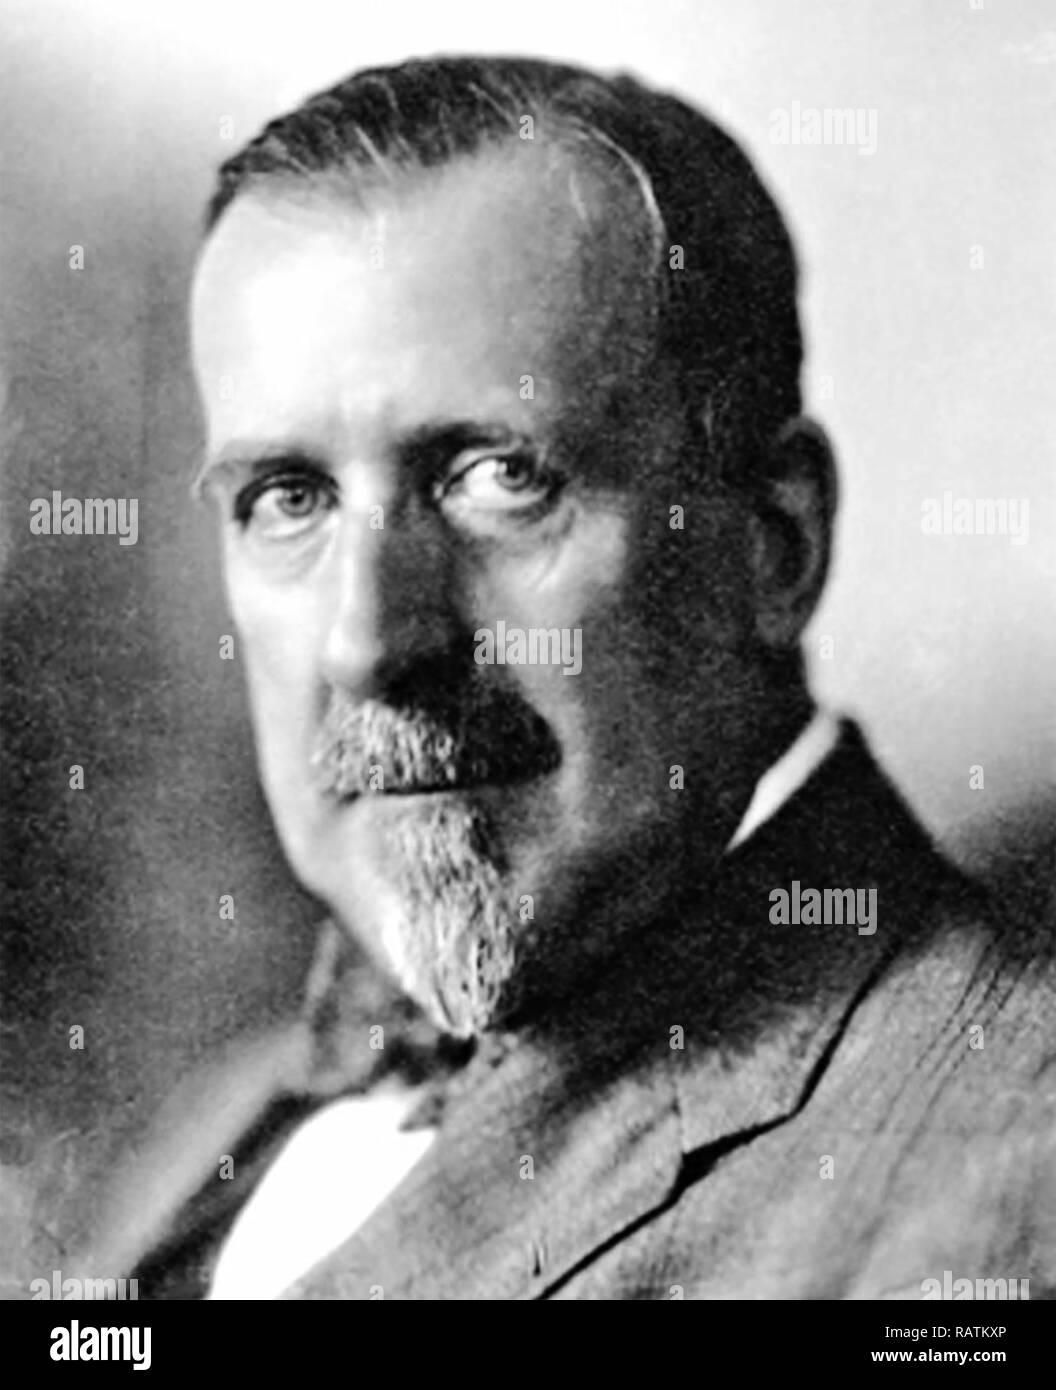 HEINRICH MANN (1871-1950) German novelist - Stock Image